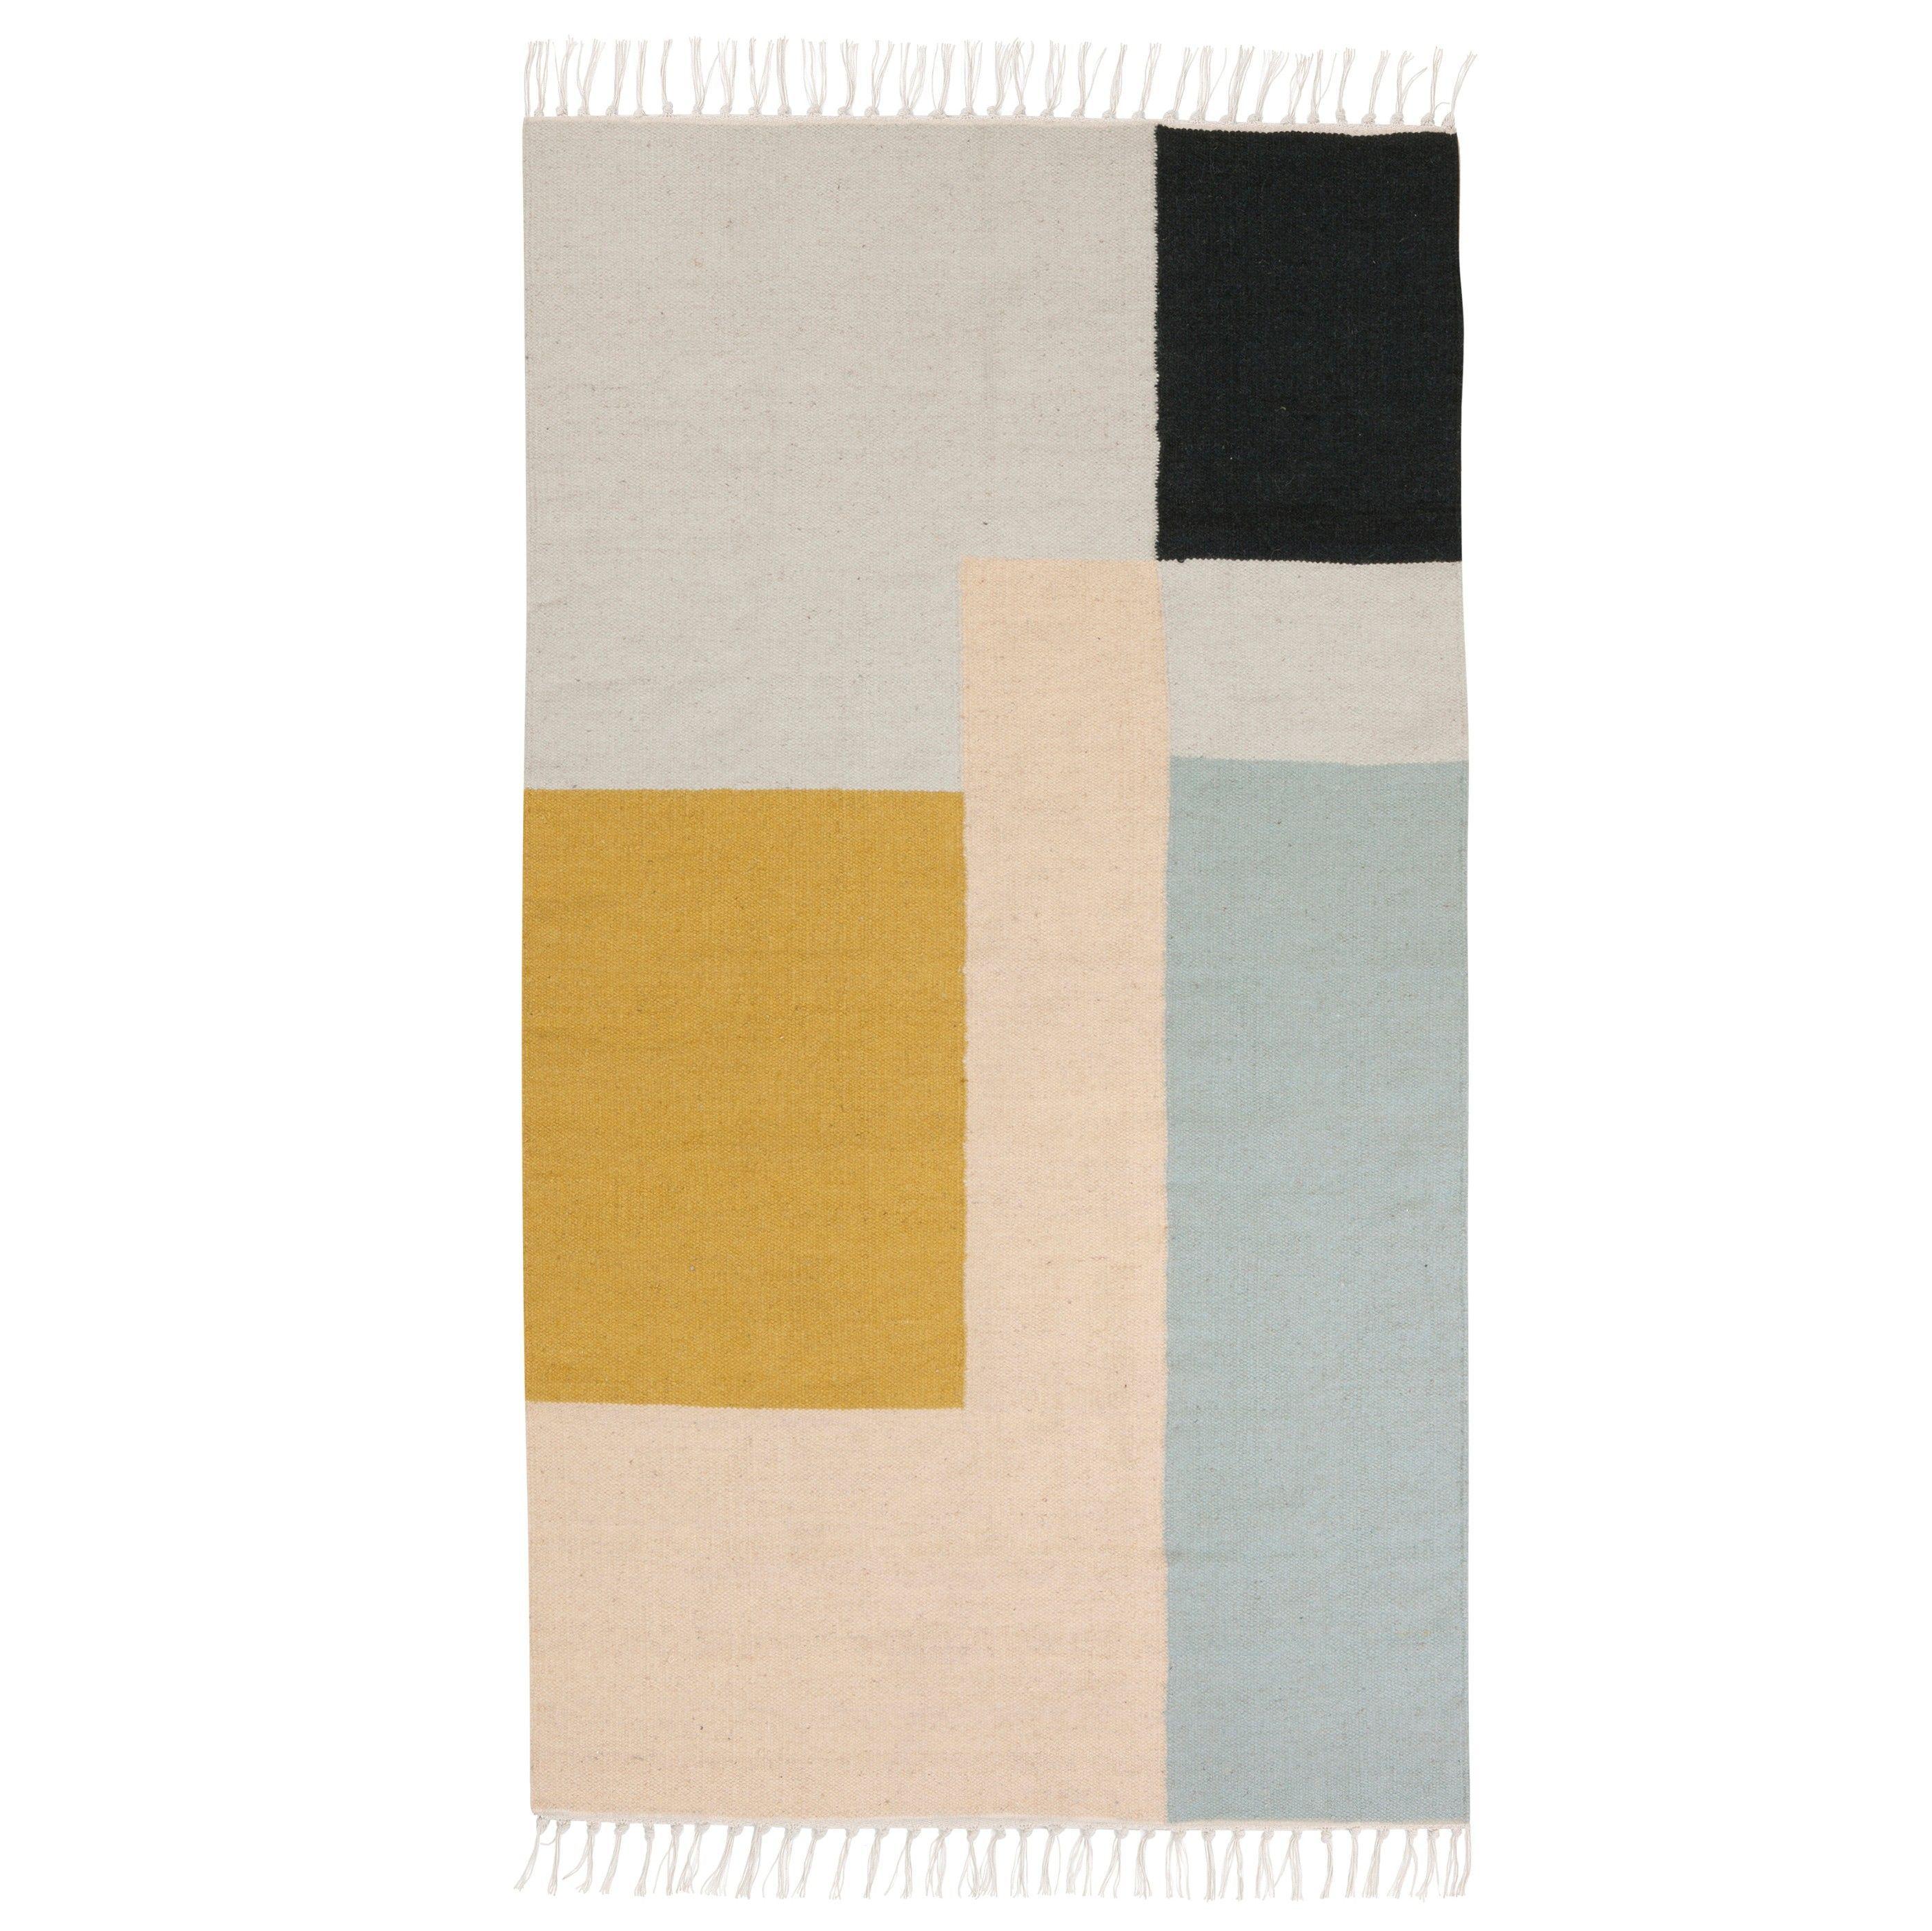 Kelim Vloerkleed Squares Small 80x140 Ferm Living Teppich Kelim Teppich Teppich Reinigen